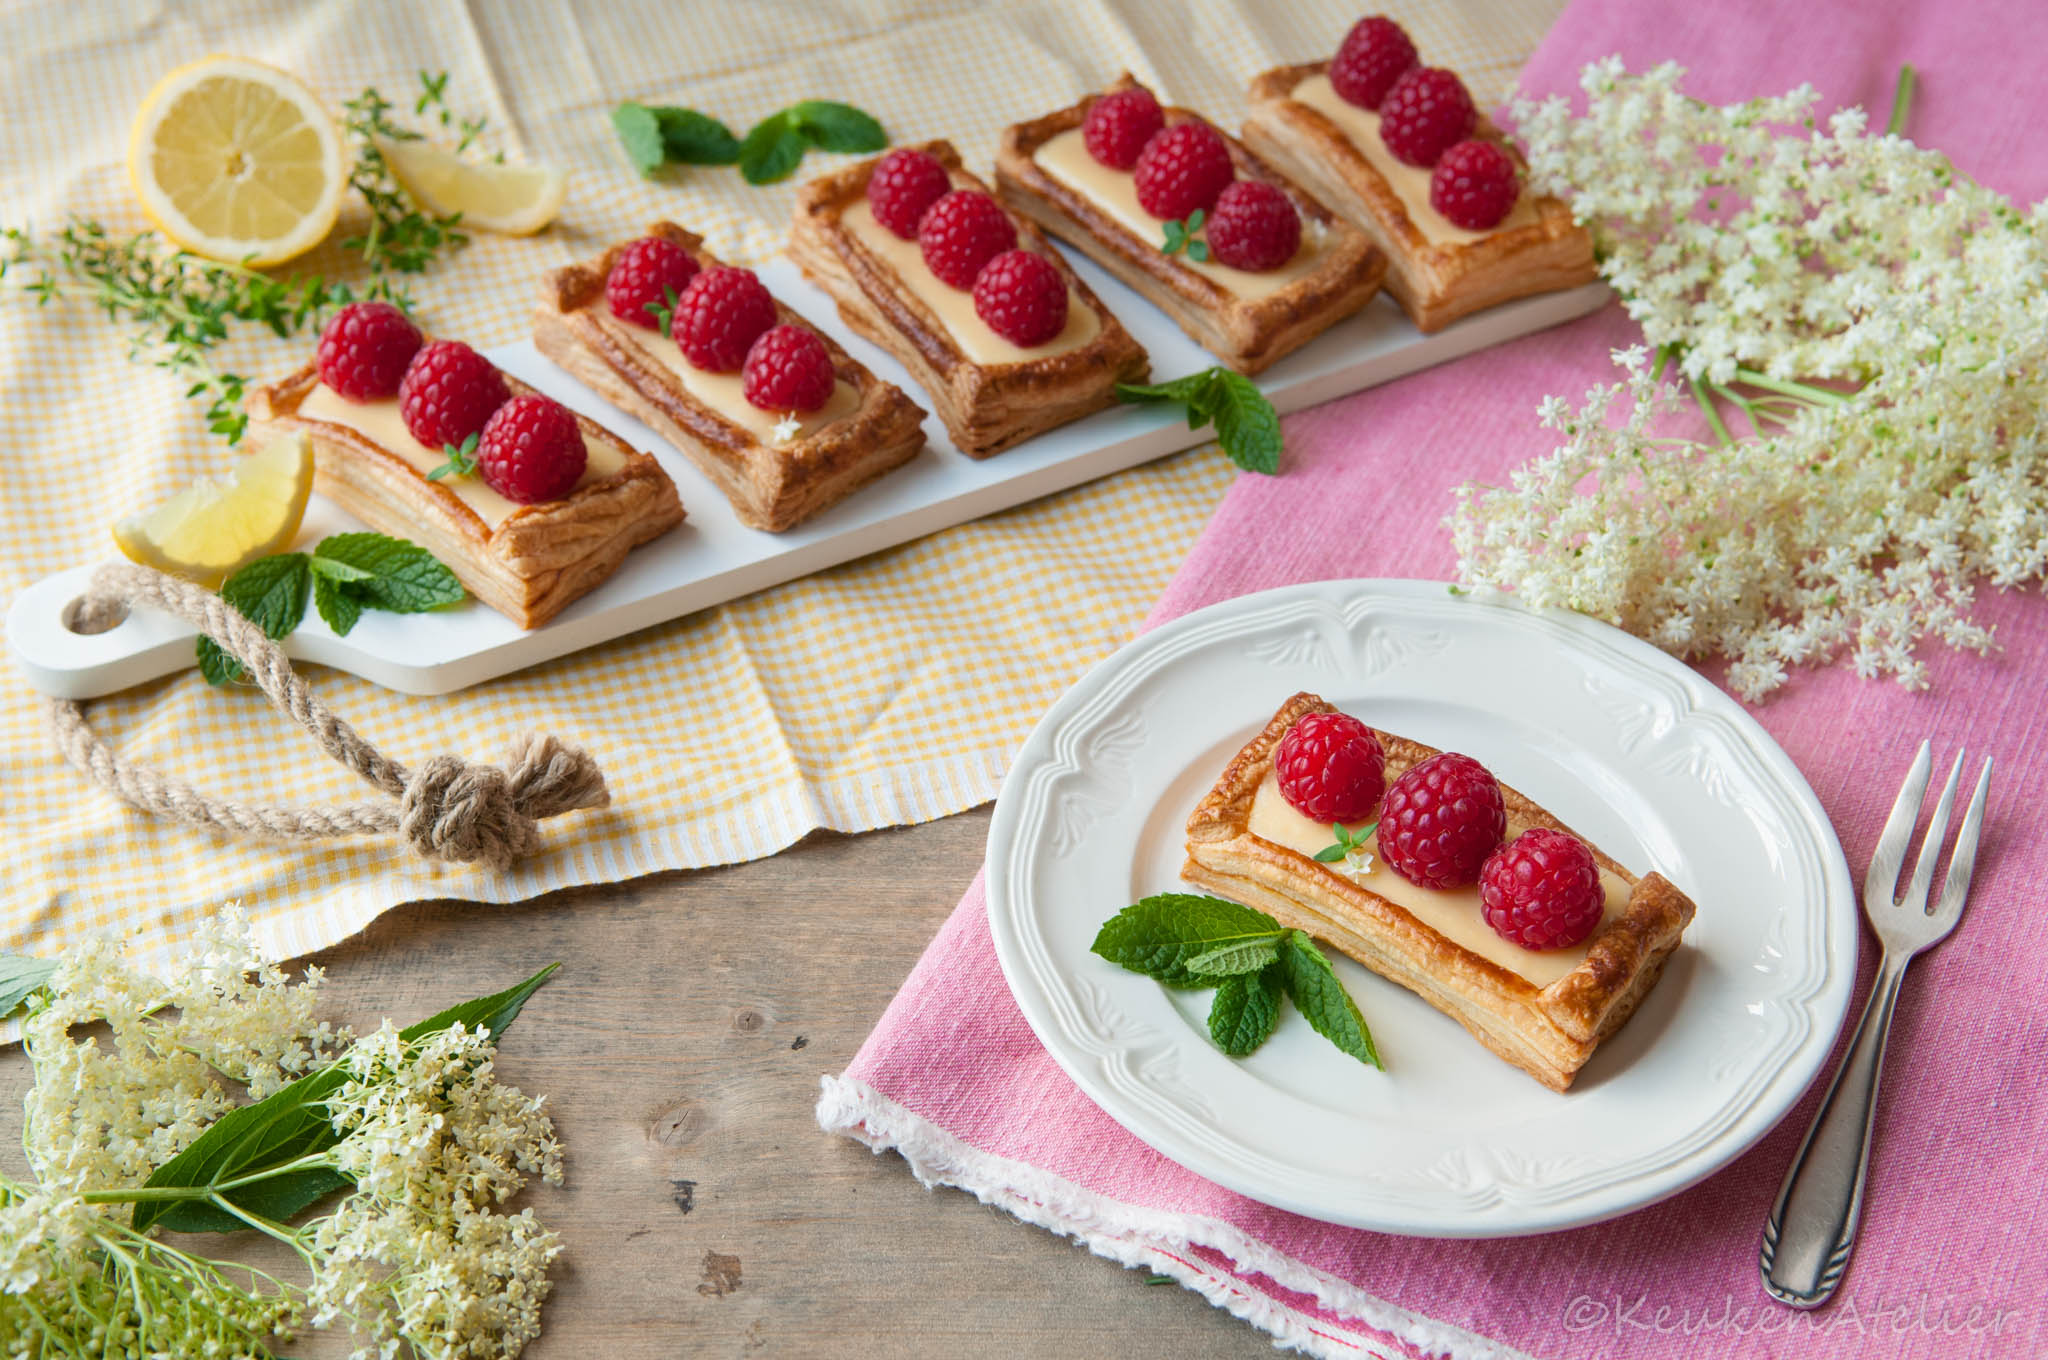 citroen frambozen taartjes 1 | KeukenAtelier.com